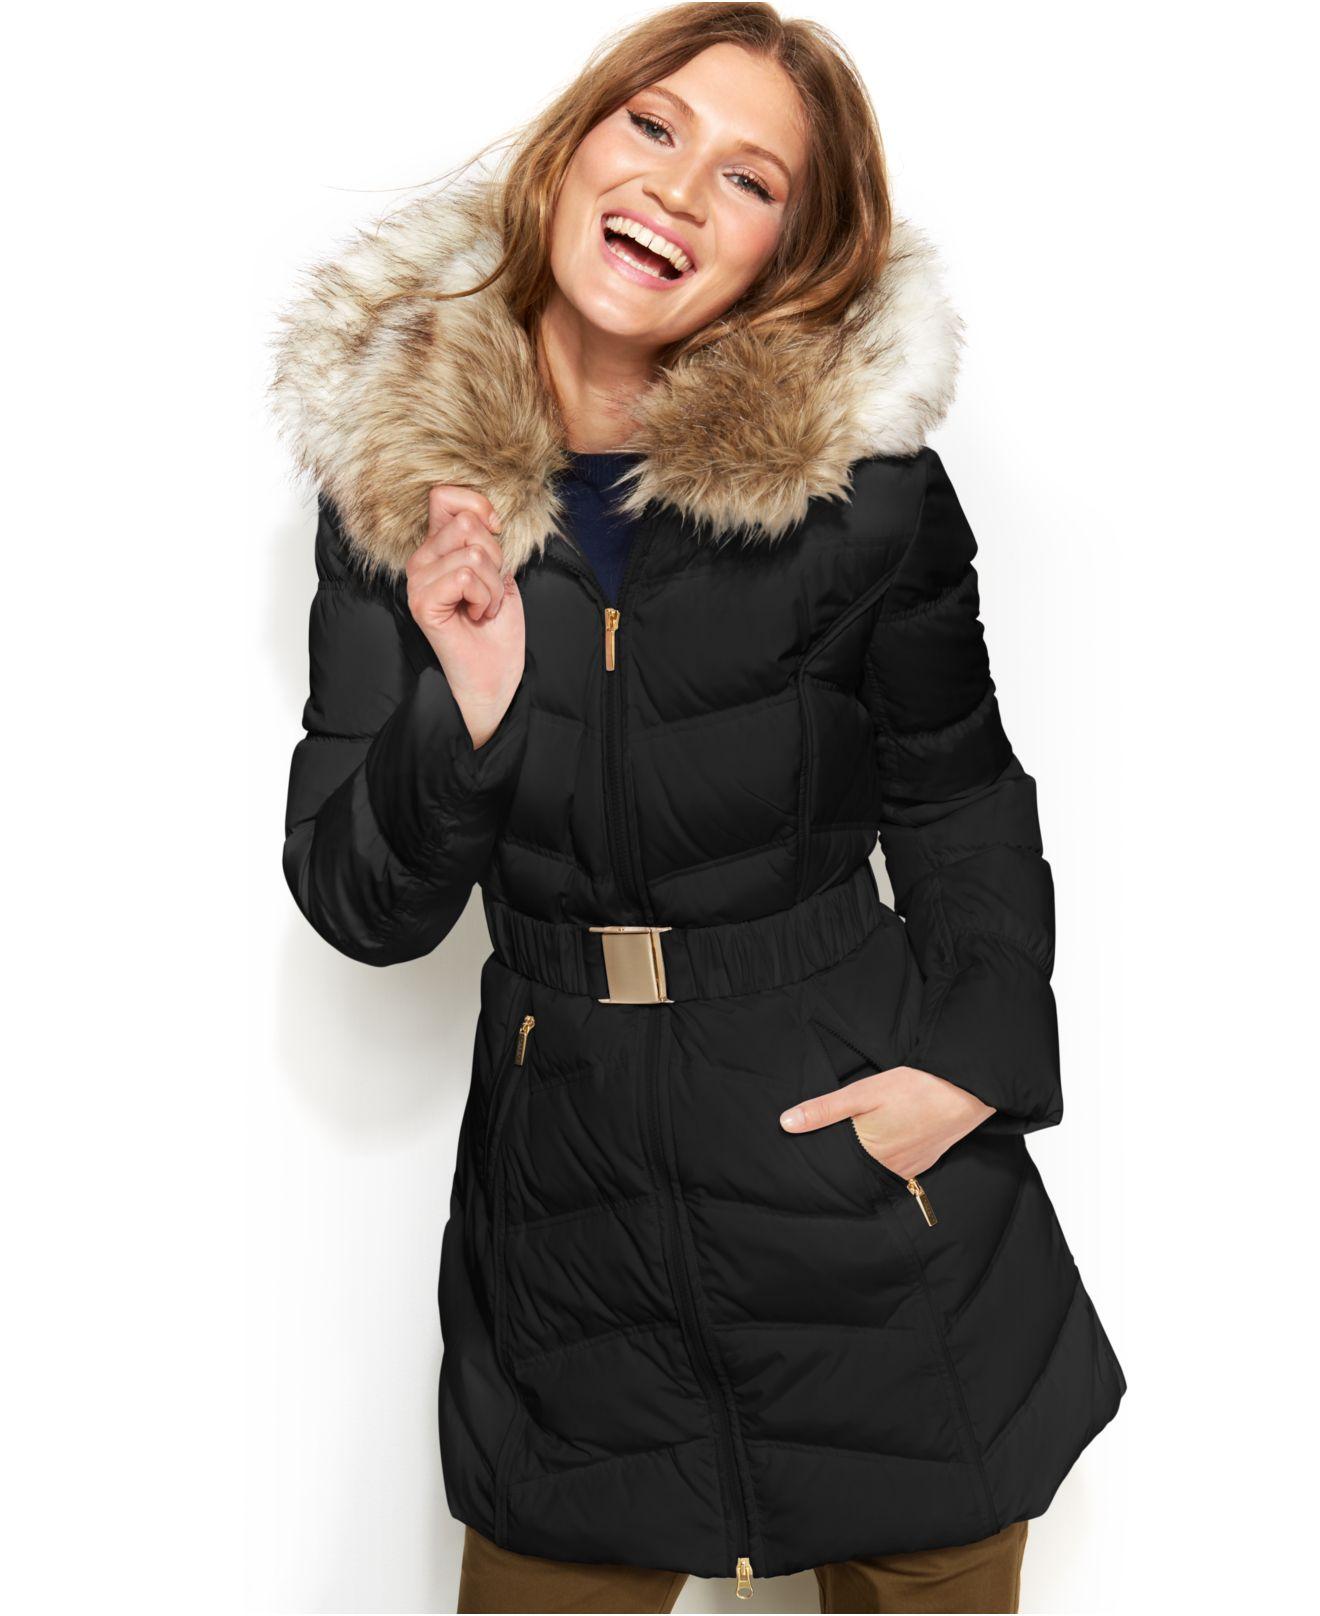 caa0f99c1da6 Tianna Black Faux Fur Hooded Coat. Must Have Hooded Winter Coats  Nationtrendz Com